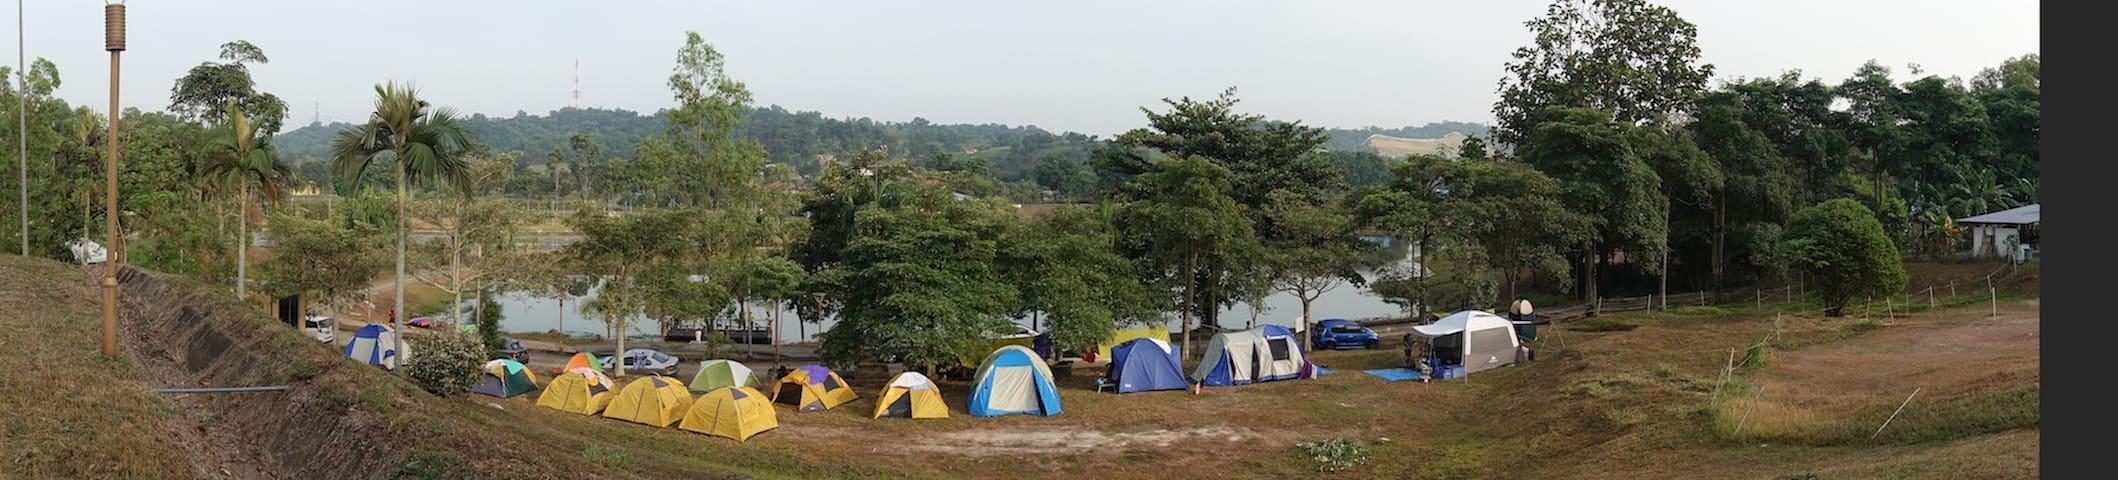 The Nest Outdoor Campsite